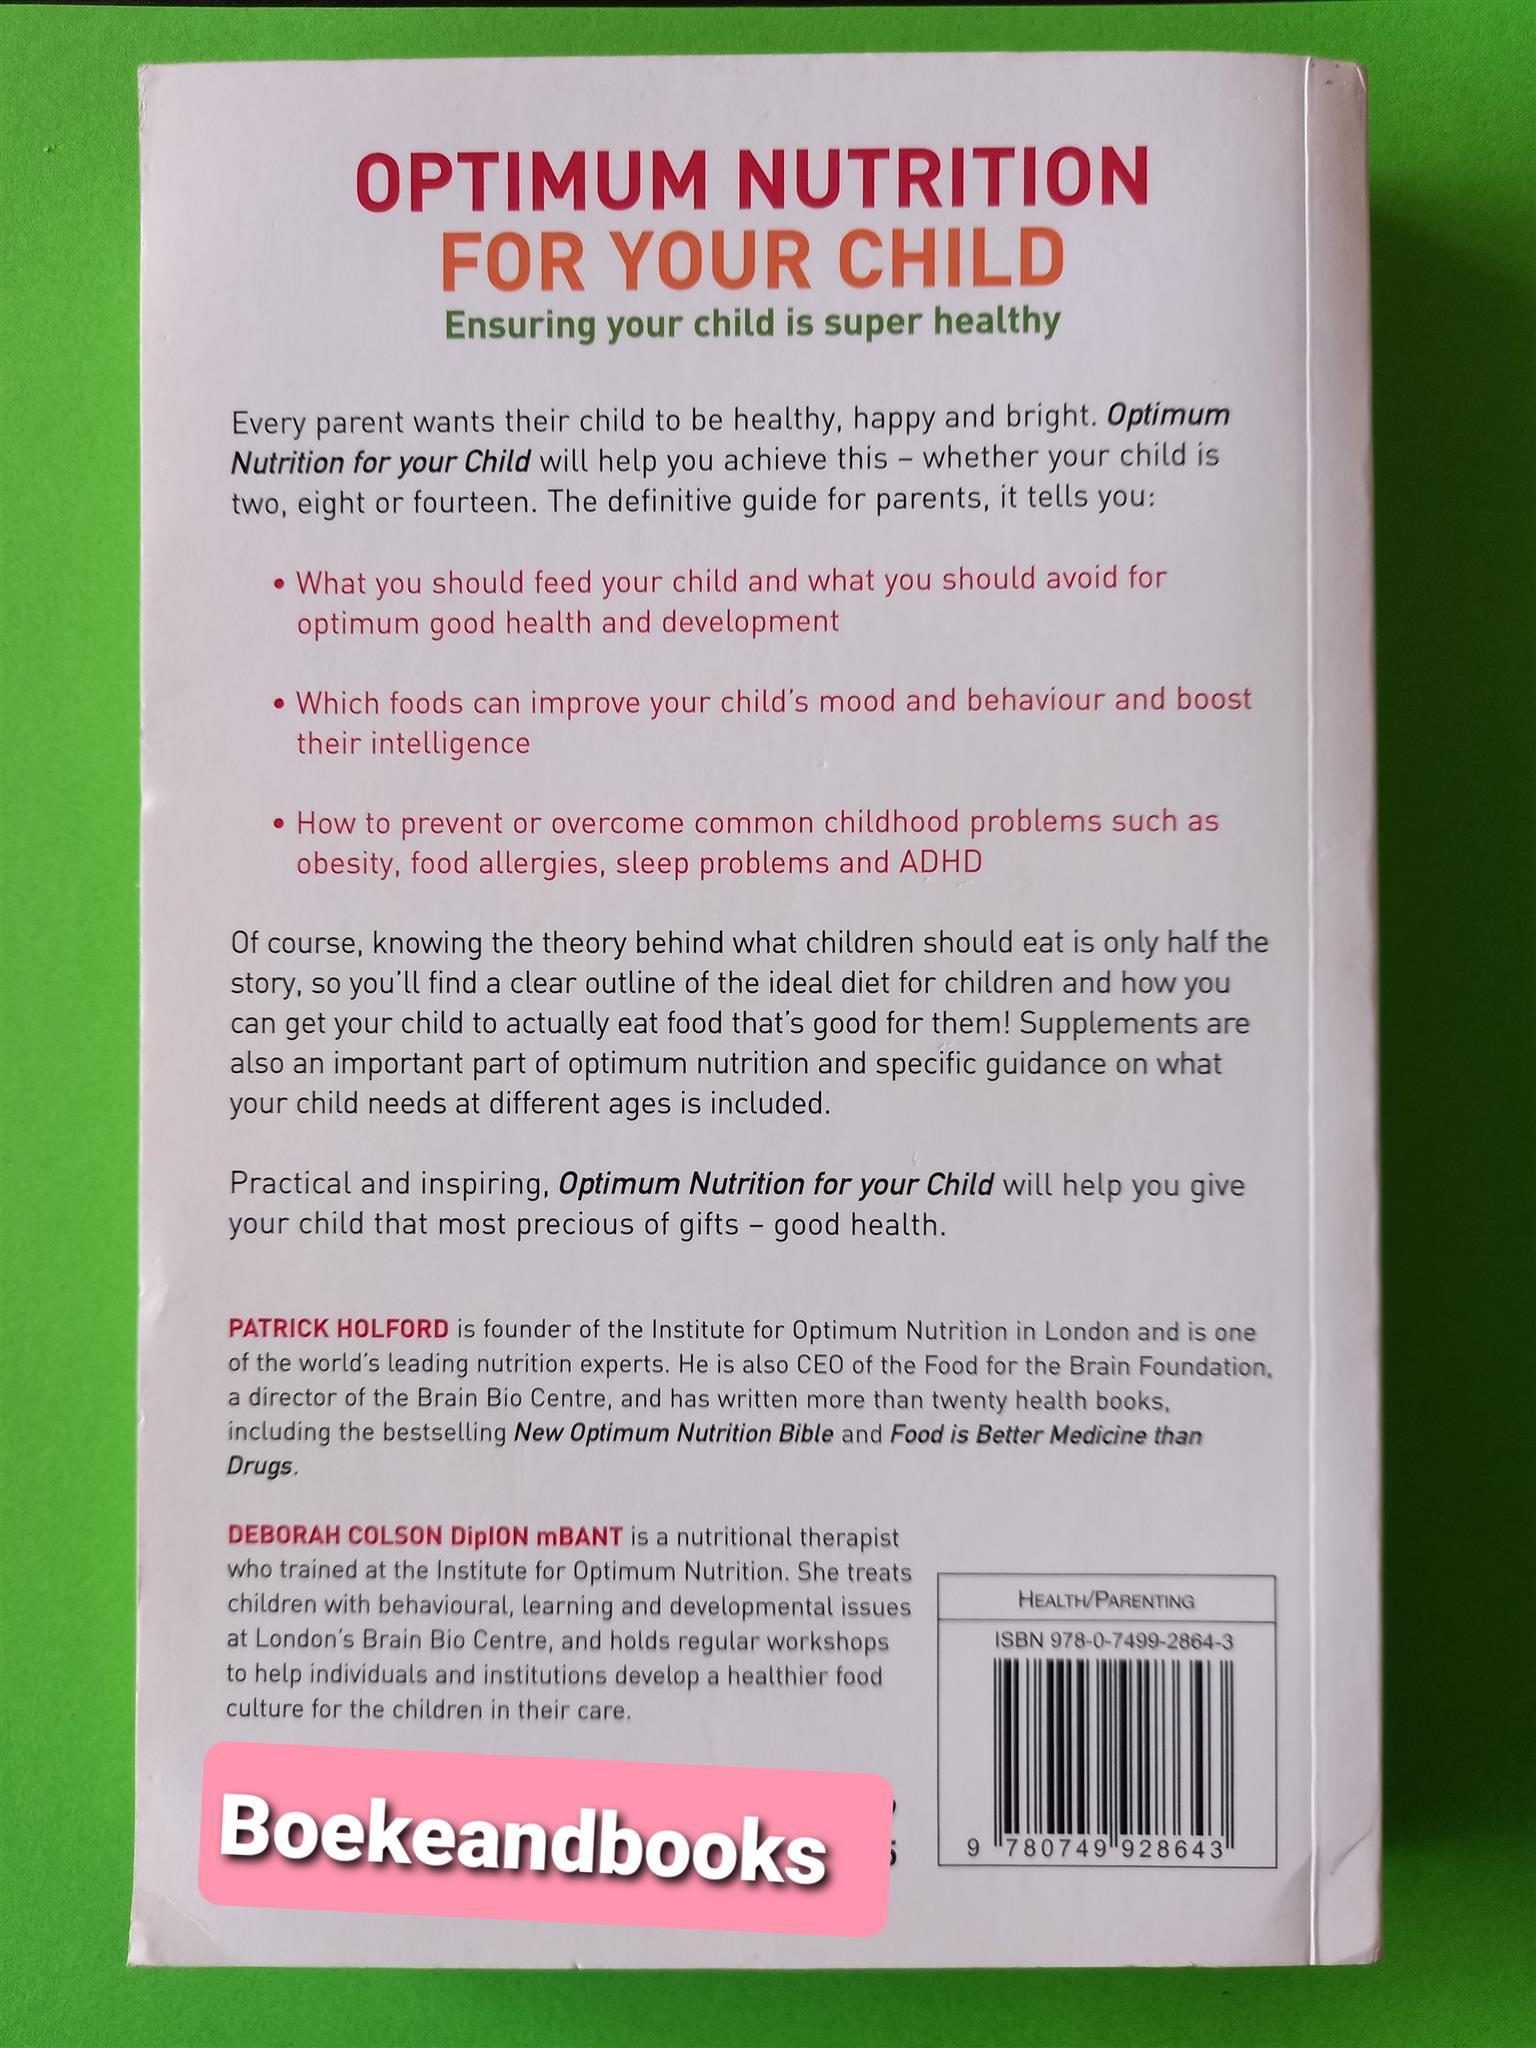 Optimum Nutrition For Your Child - Patrick Holford - Deborah Colson.